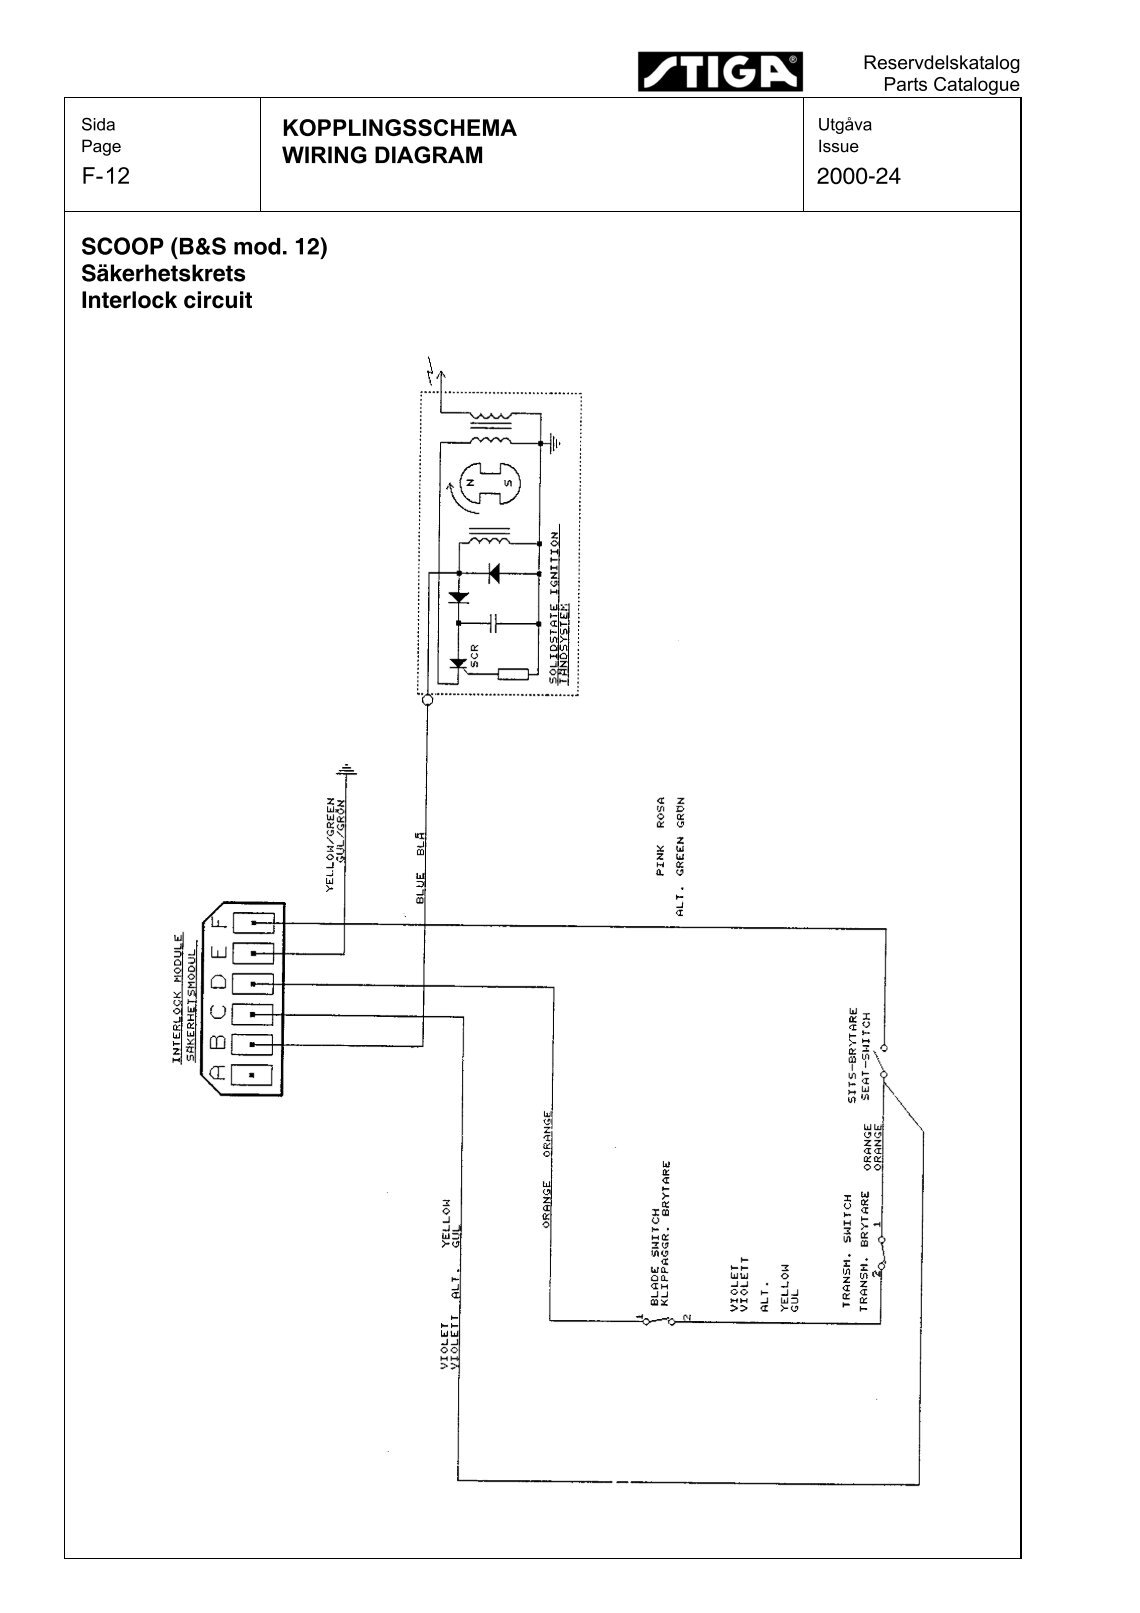 M1009 Cucv Wiring Diagram Manual Guide 85 Chevy Alternator M1008 Schematics Rh Regdiy Co Ammeter